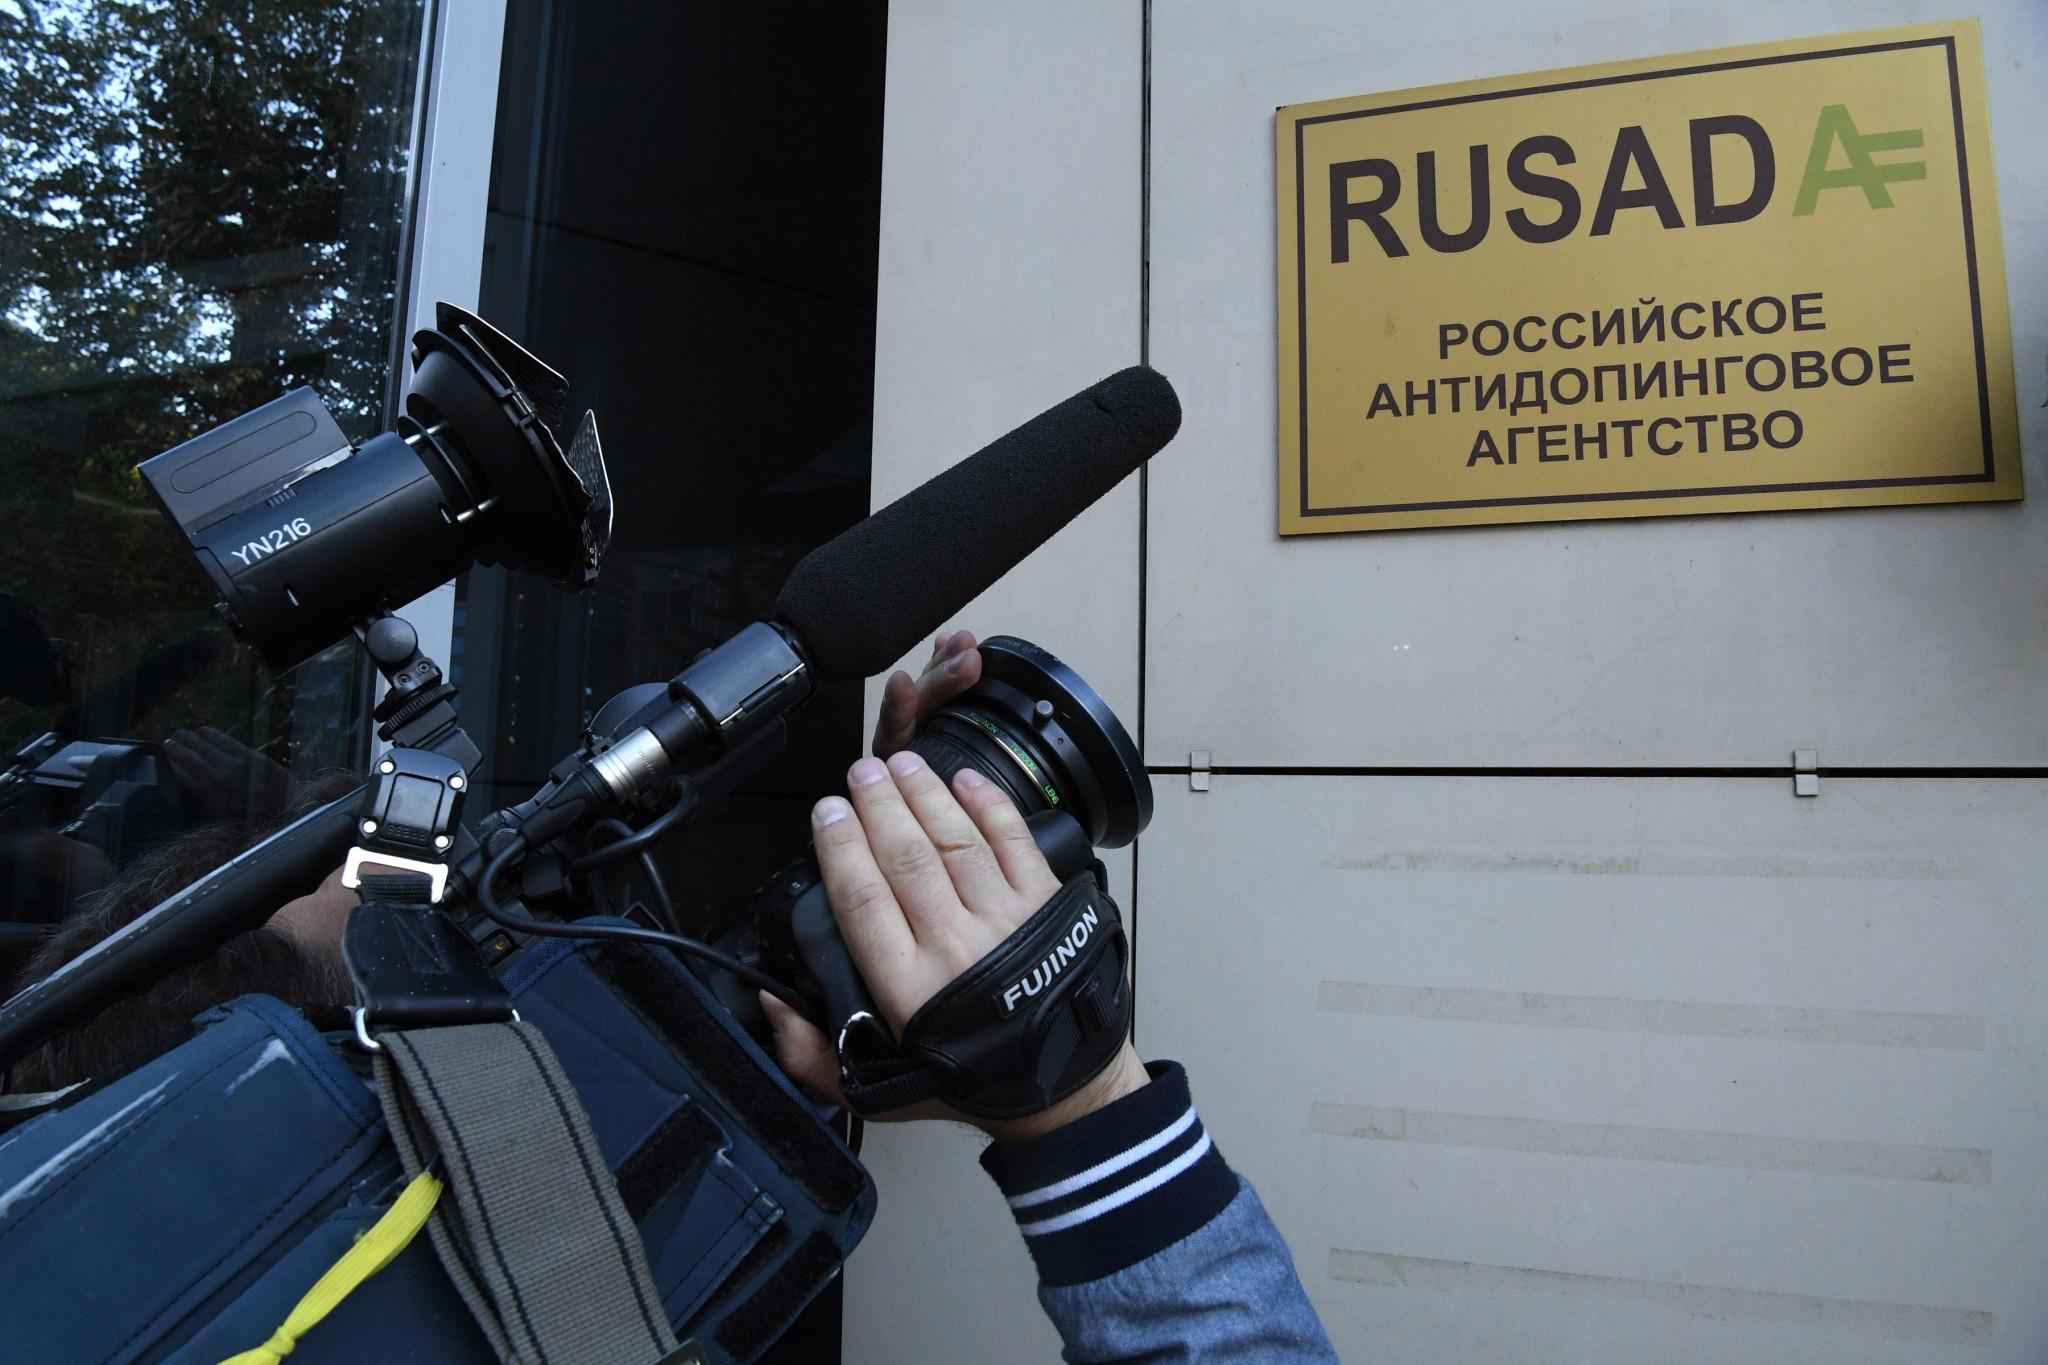 The reinstatement of RUSADA has caused widespread debate ©Getty Images